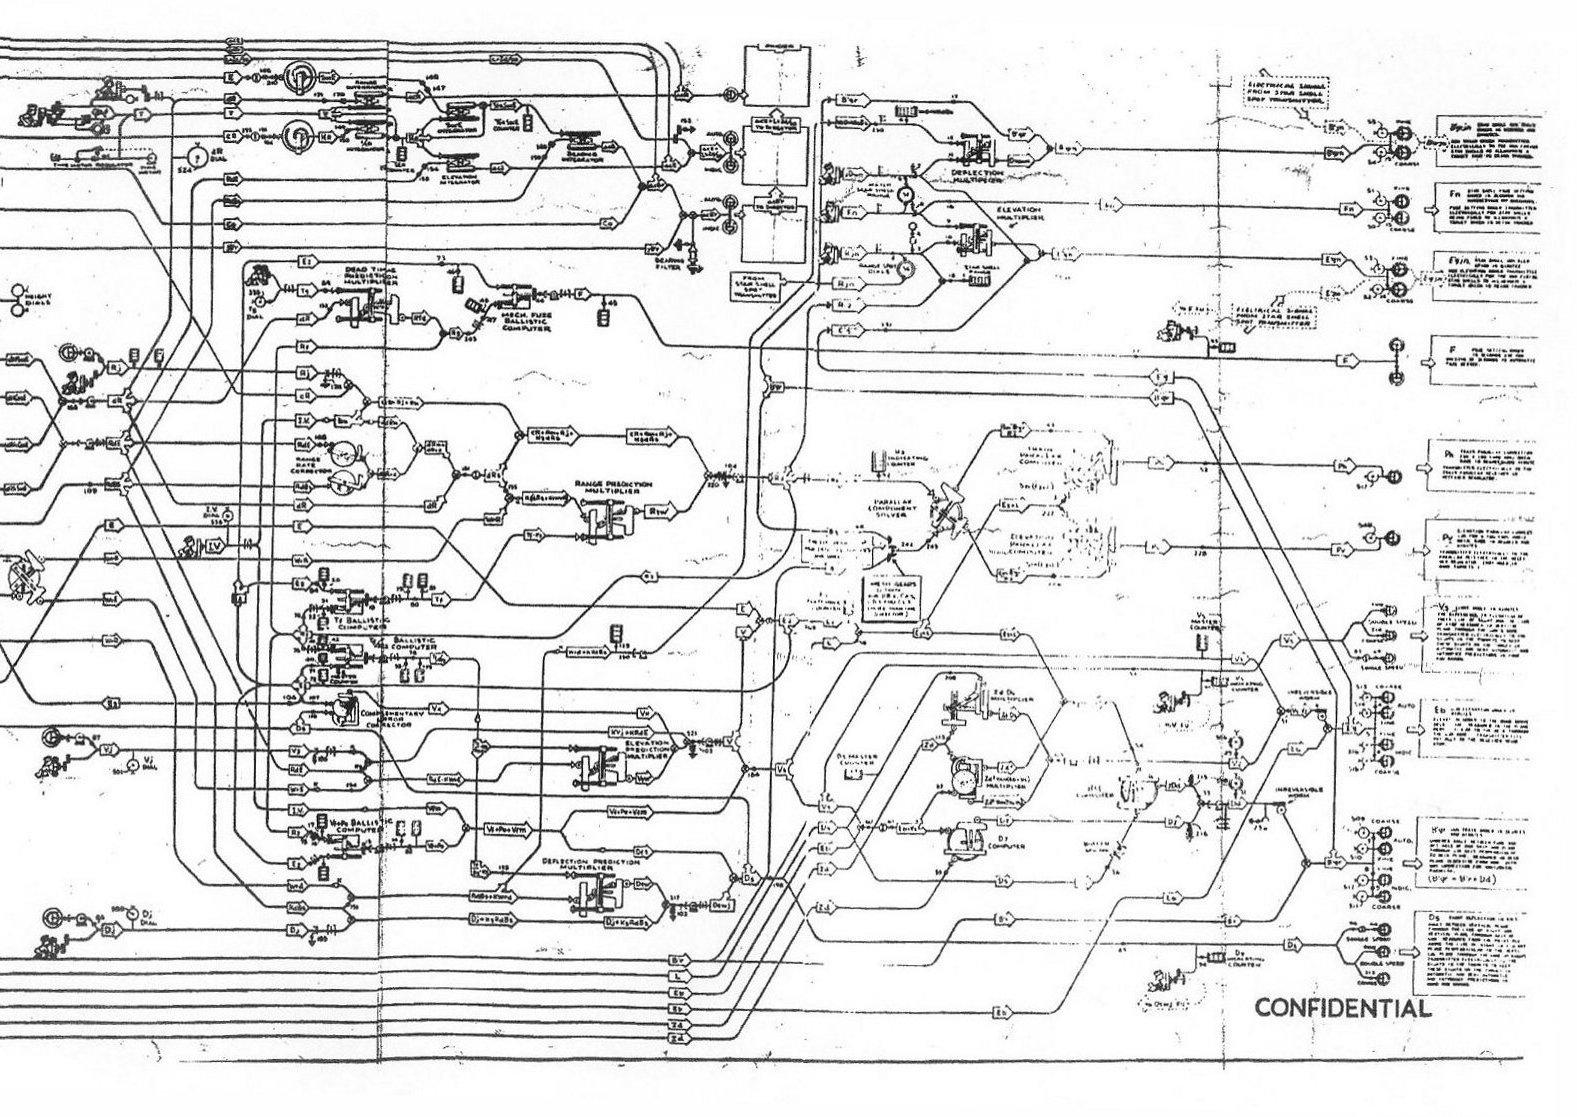 Computer Schematic Diagram Electrical Diagrams Forum Dvb T Circuit Flow Mk 1mod 7 Rh Eugeneleeslover Com Pdf Motherboard